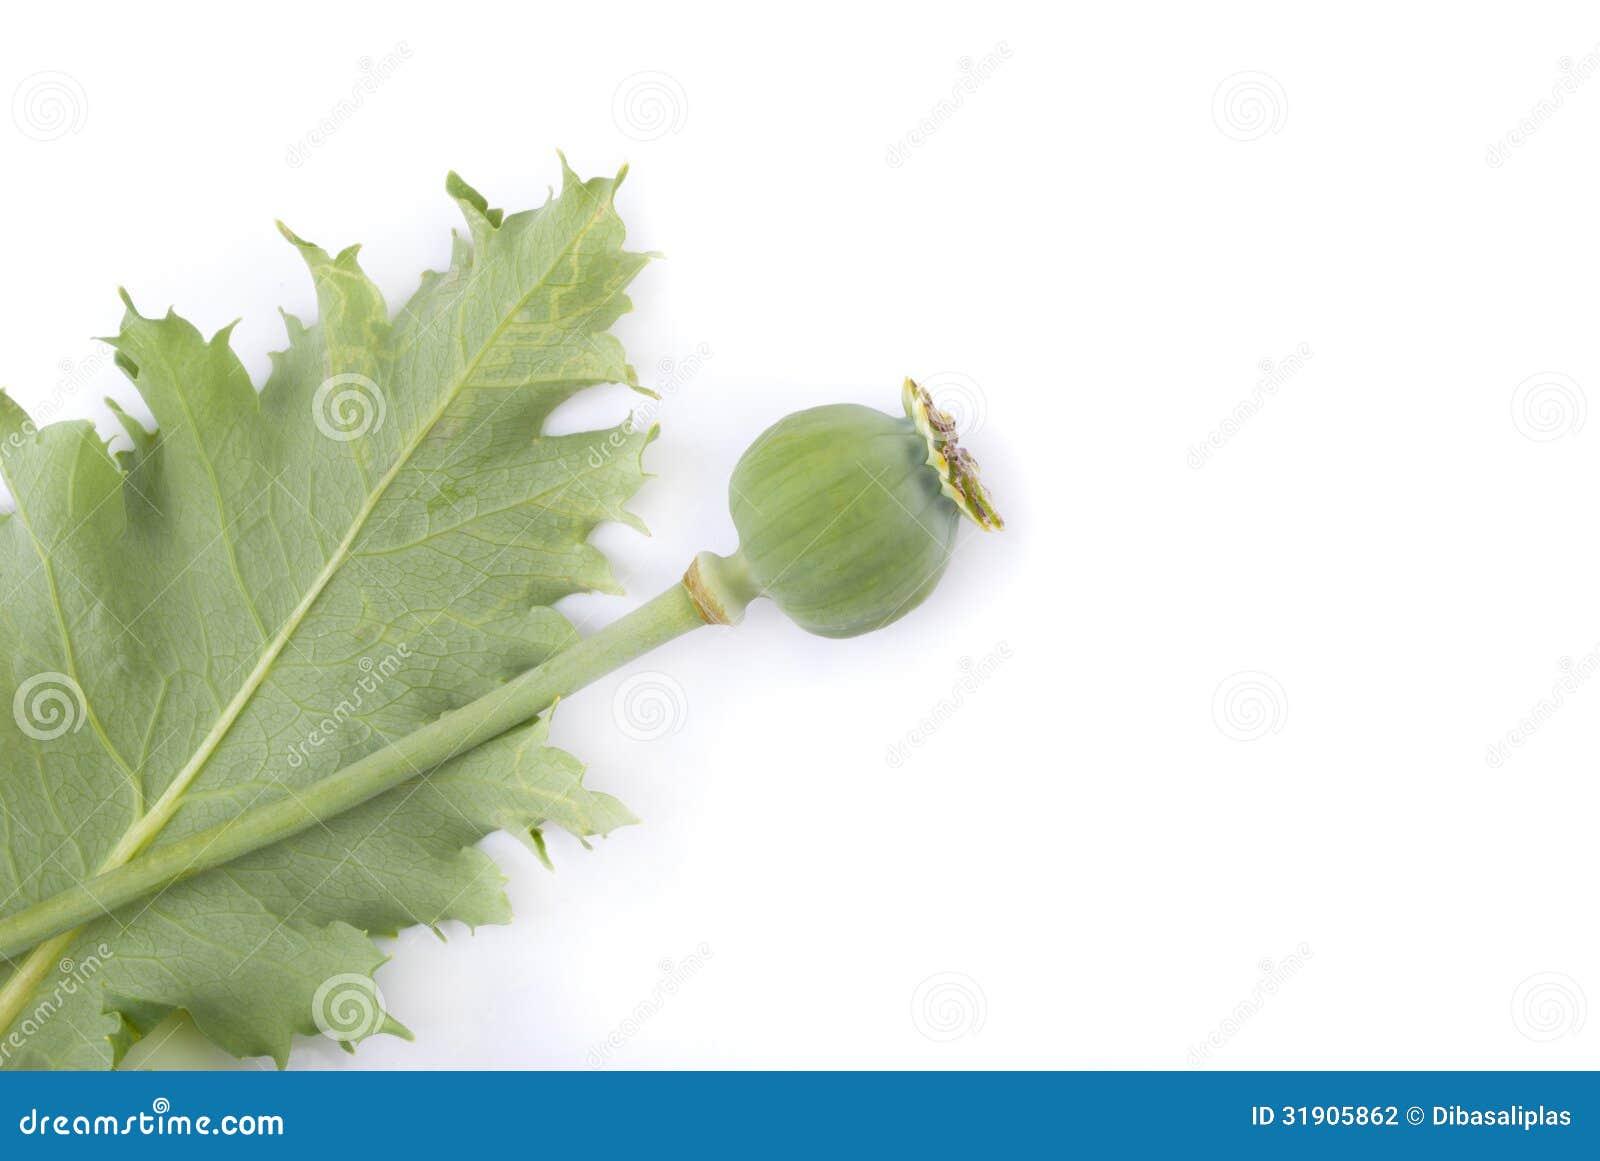 фото листья мака